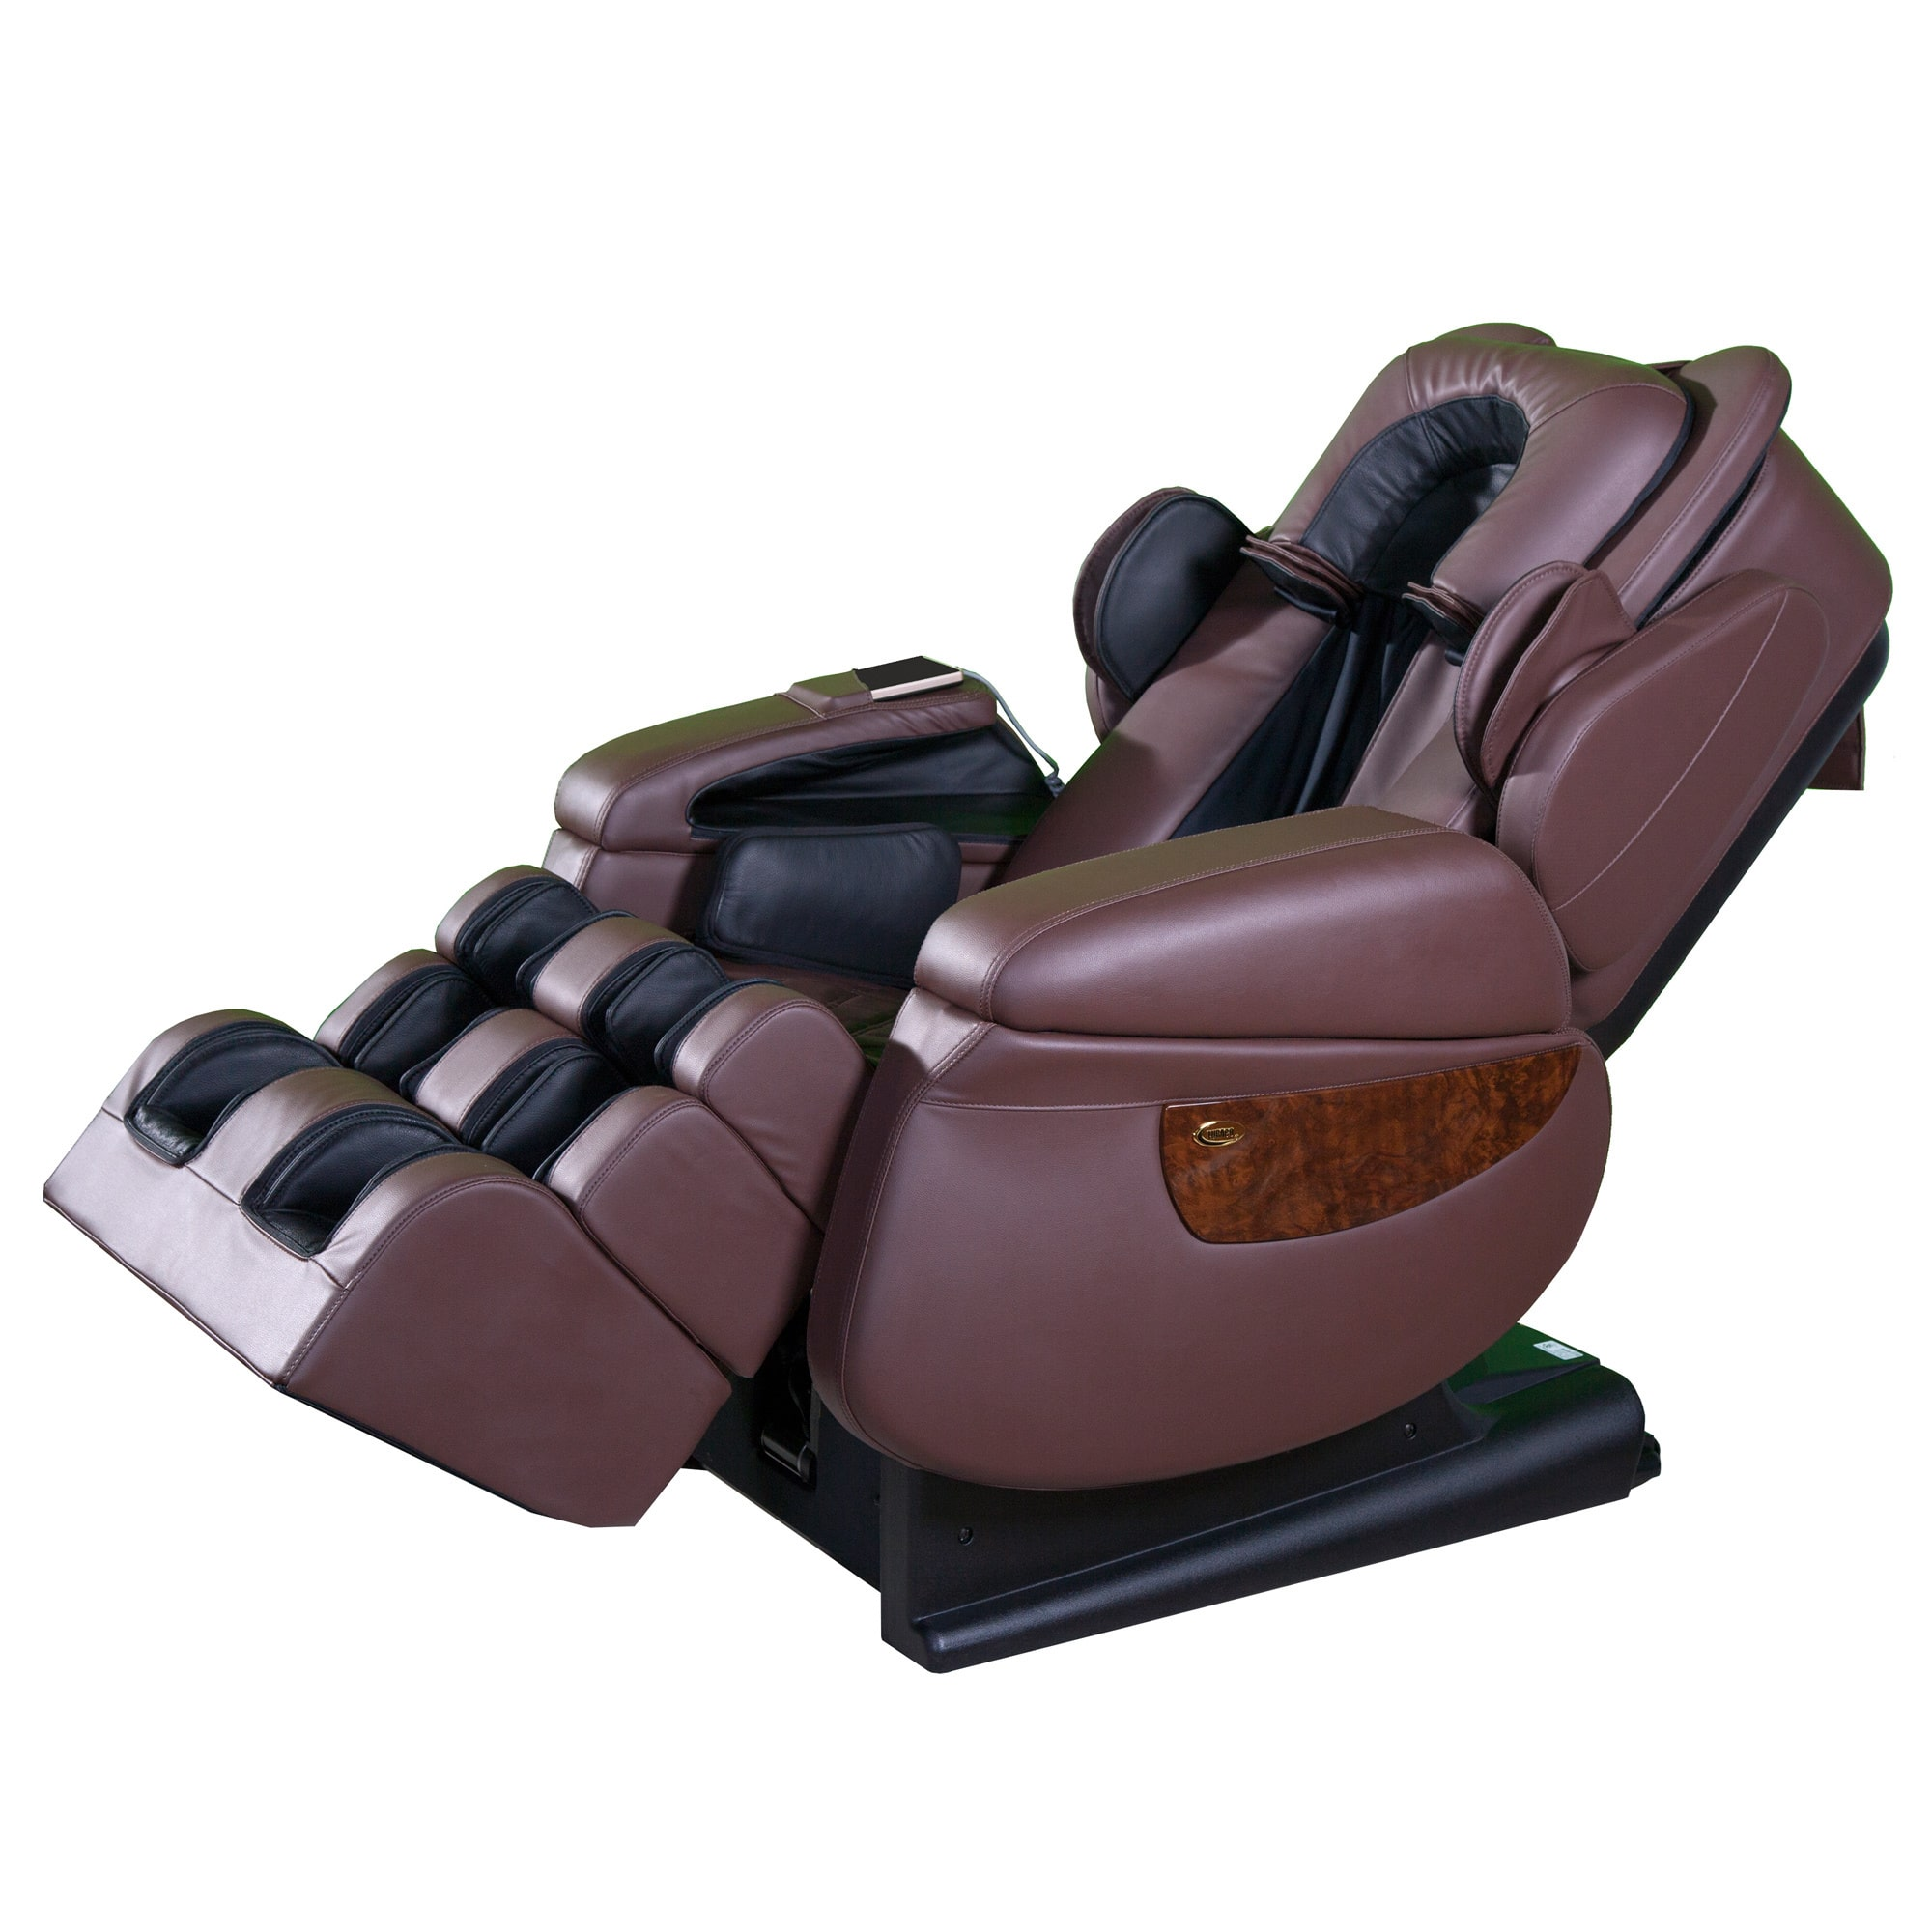 Luraco iRobotics i7 Massage Chair Black Walmart